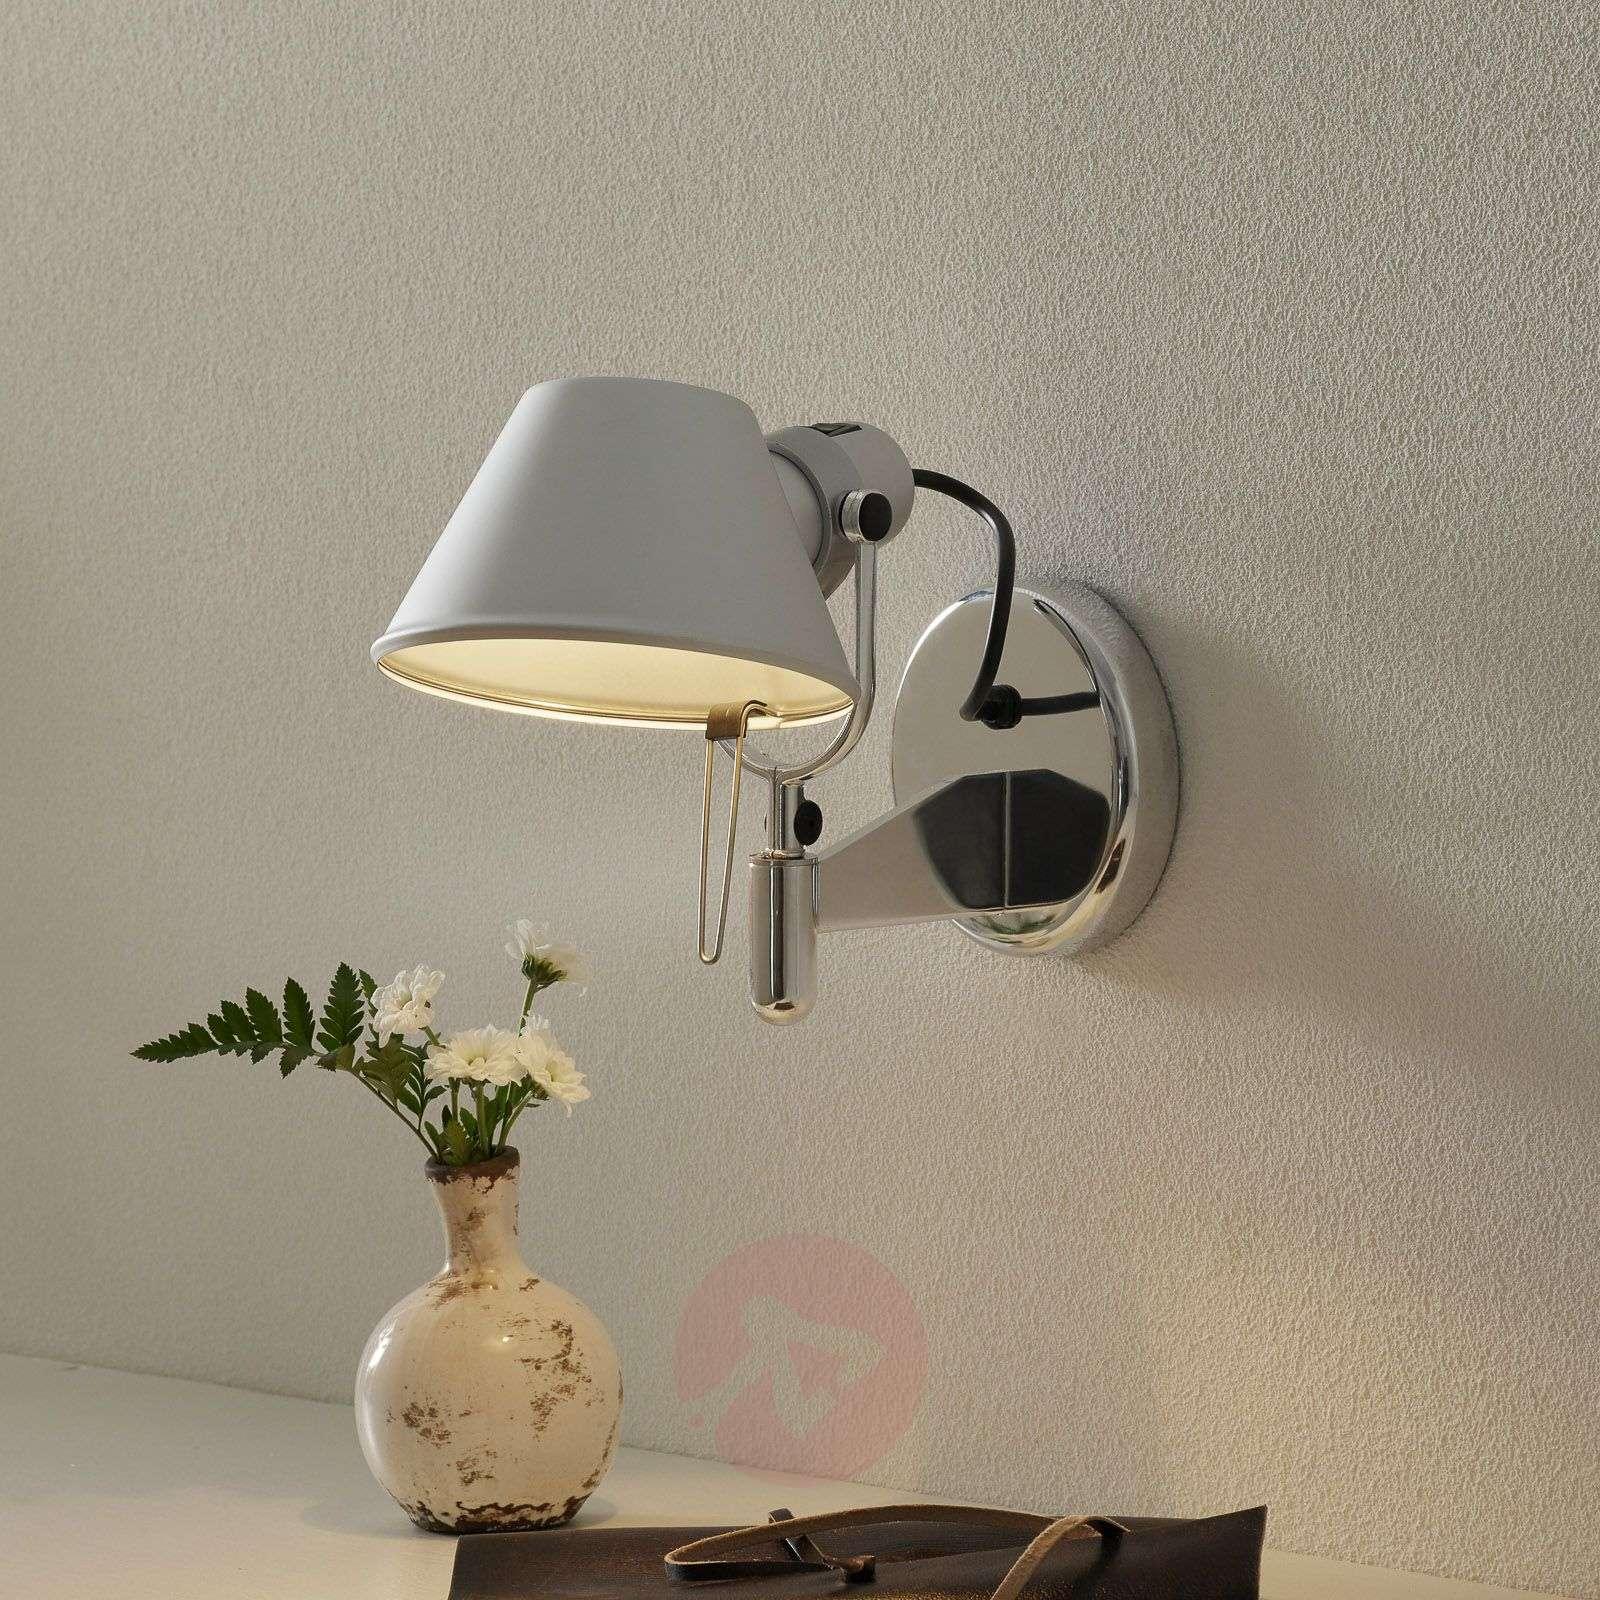 Pieni design-seinävalaisin Tolomeo Faretto-1060073-05